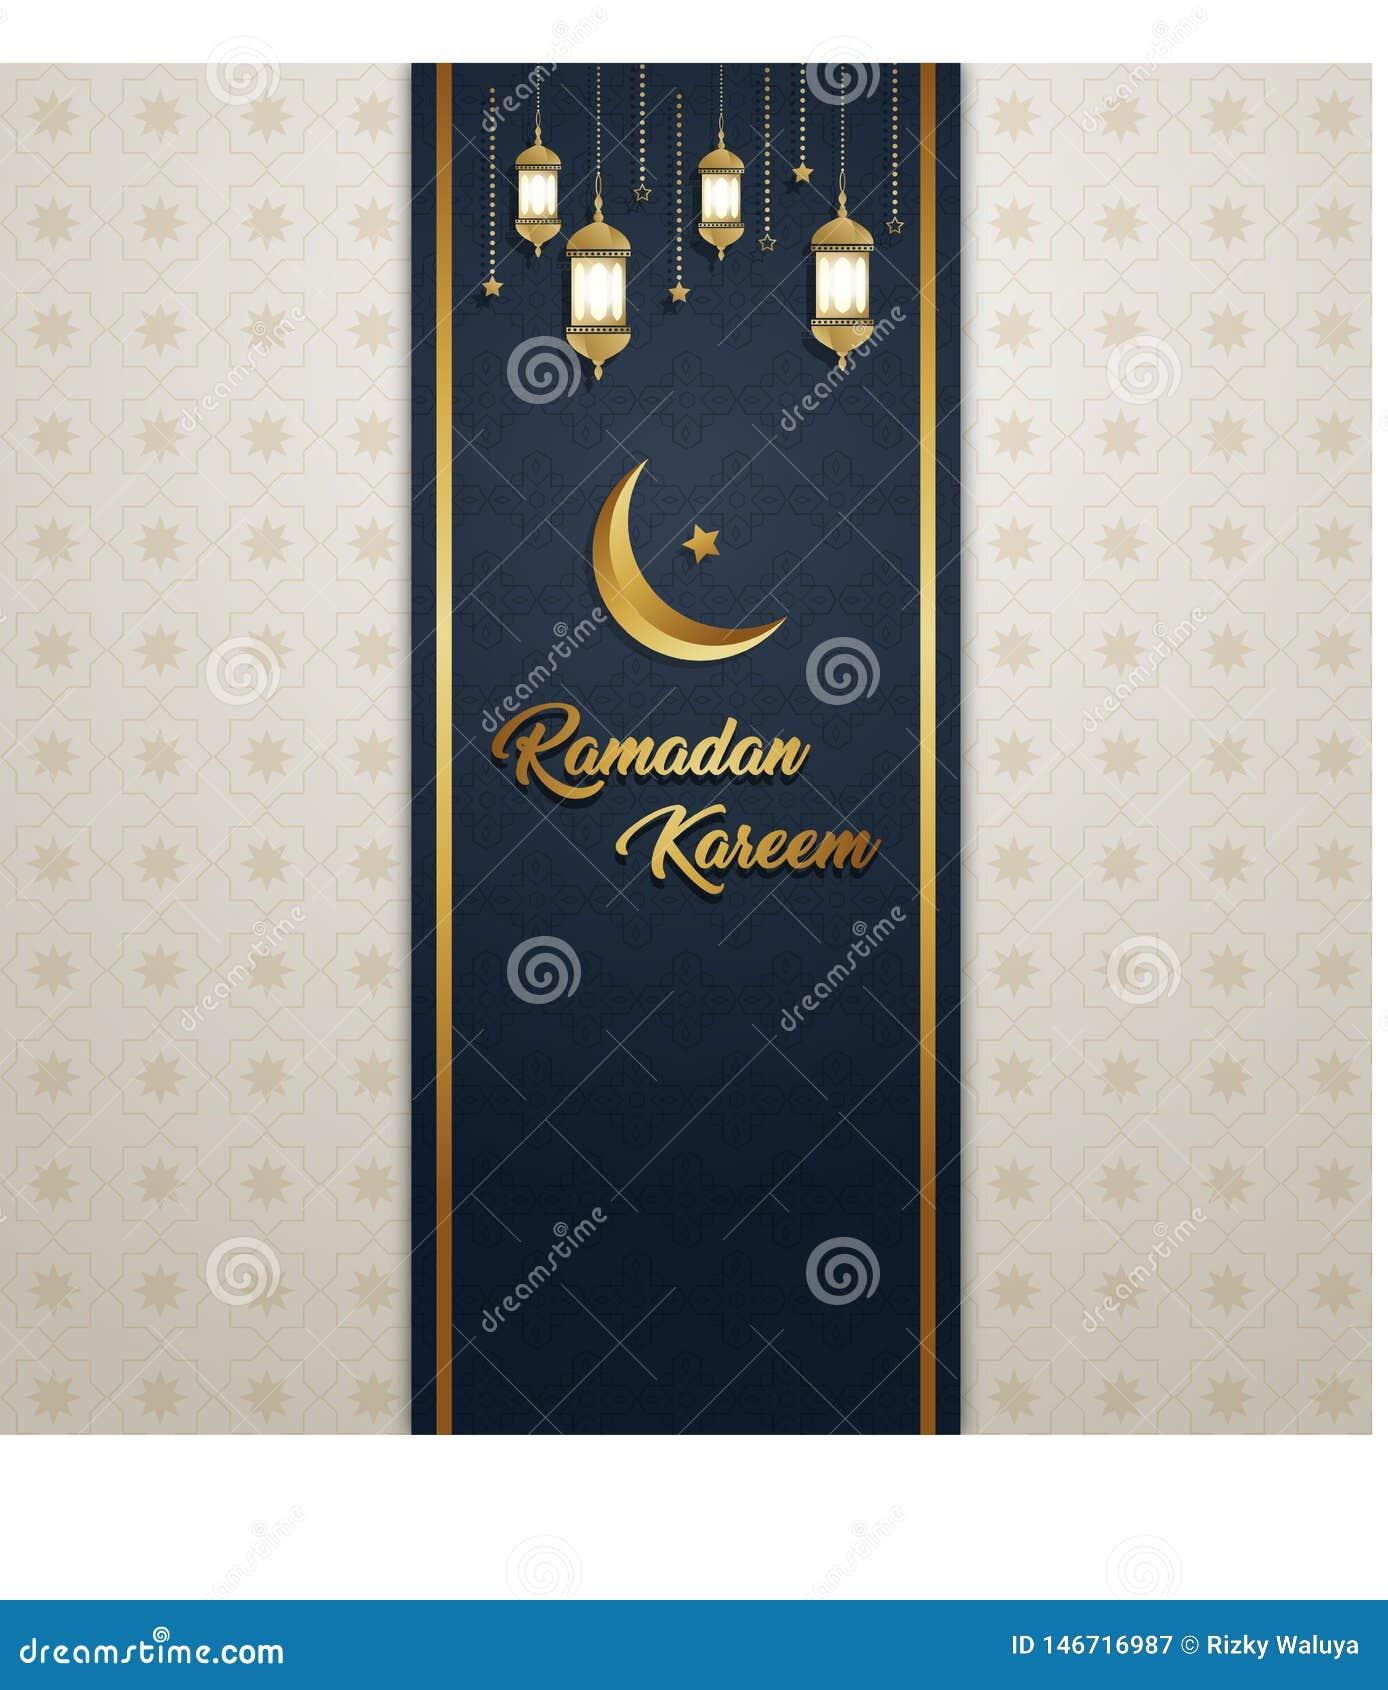 Ramadan Kareem zaproszenia sztandaru księżyc i lampionu tła wzór